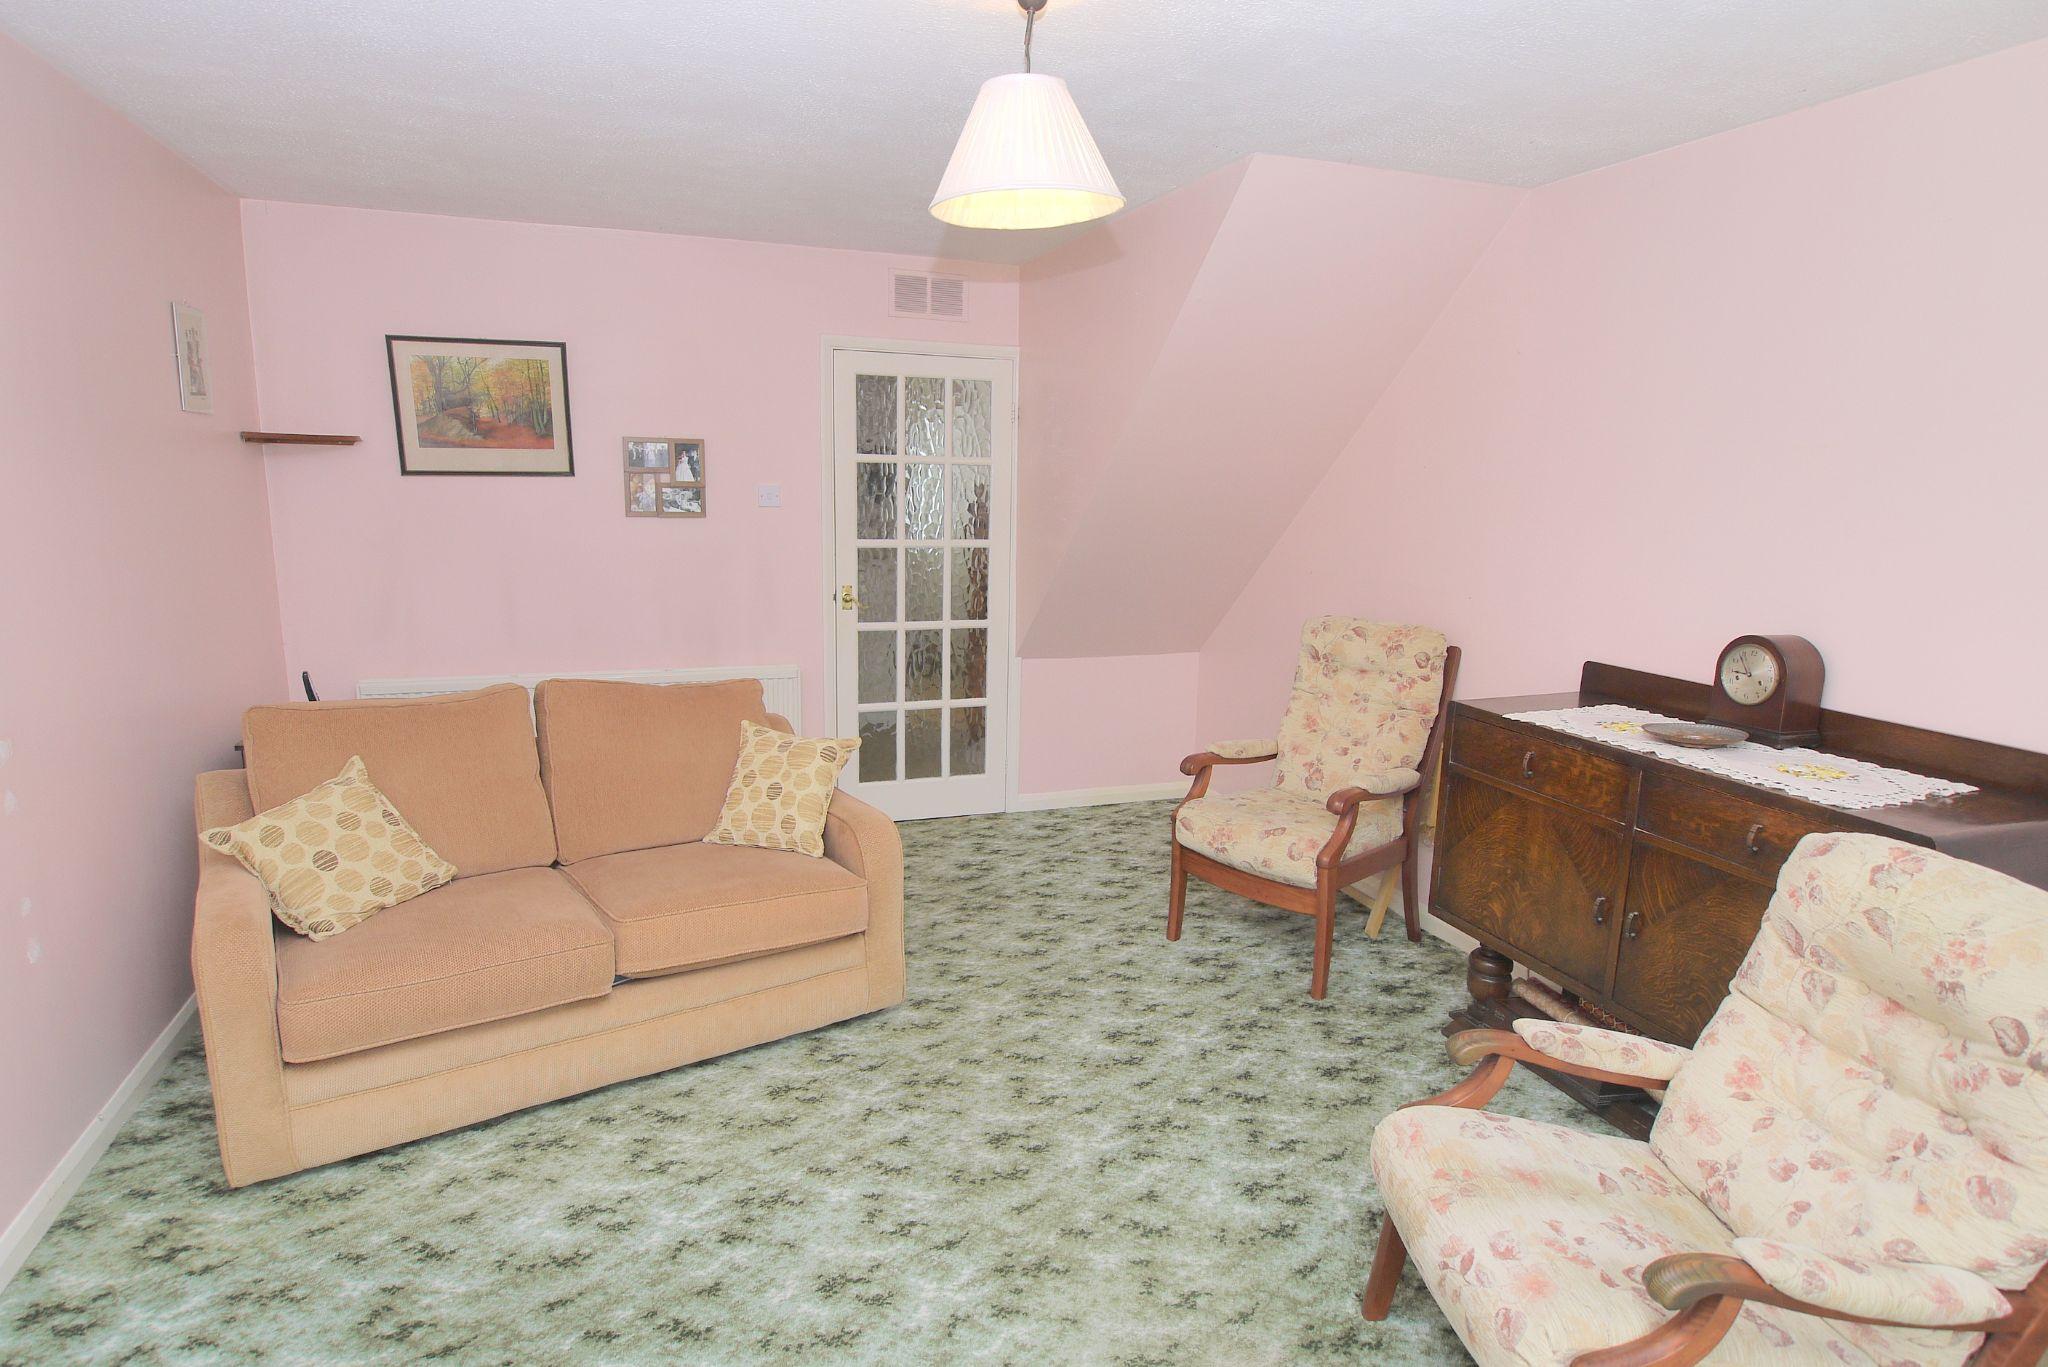 2 bedroom semi-detached house Sold in Sevenoaks - Photograph 2